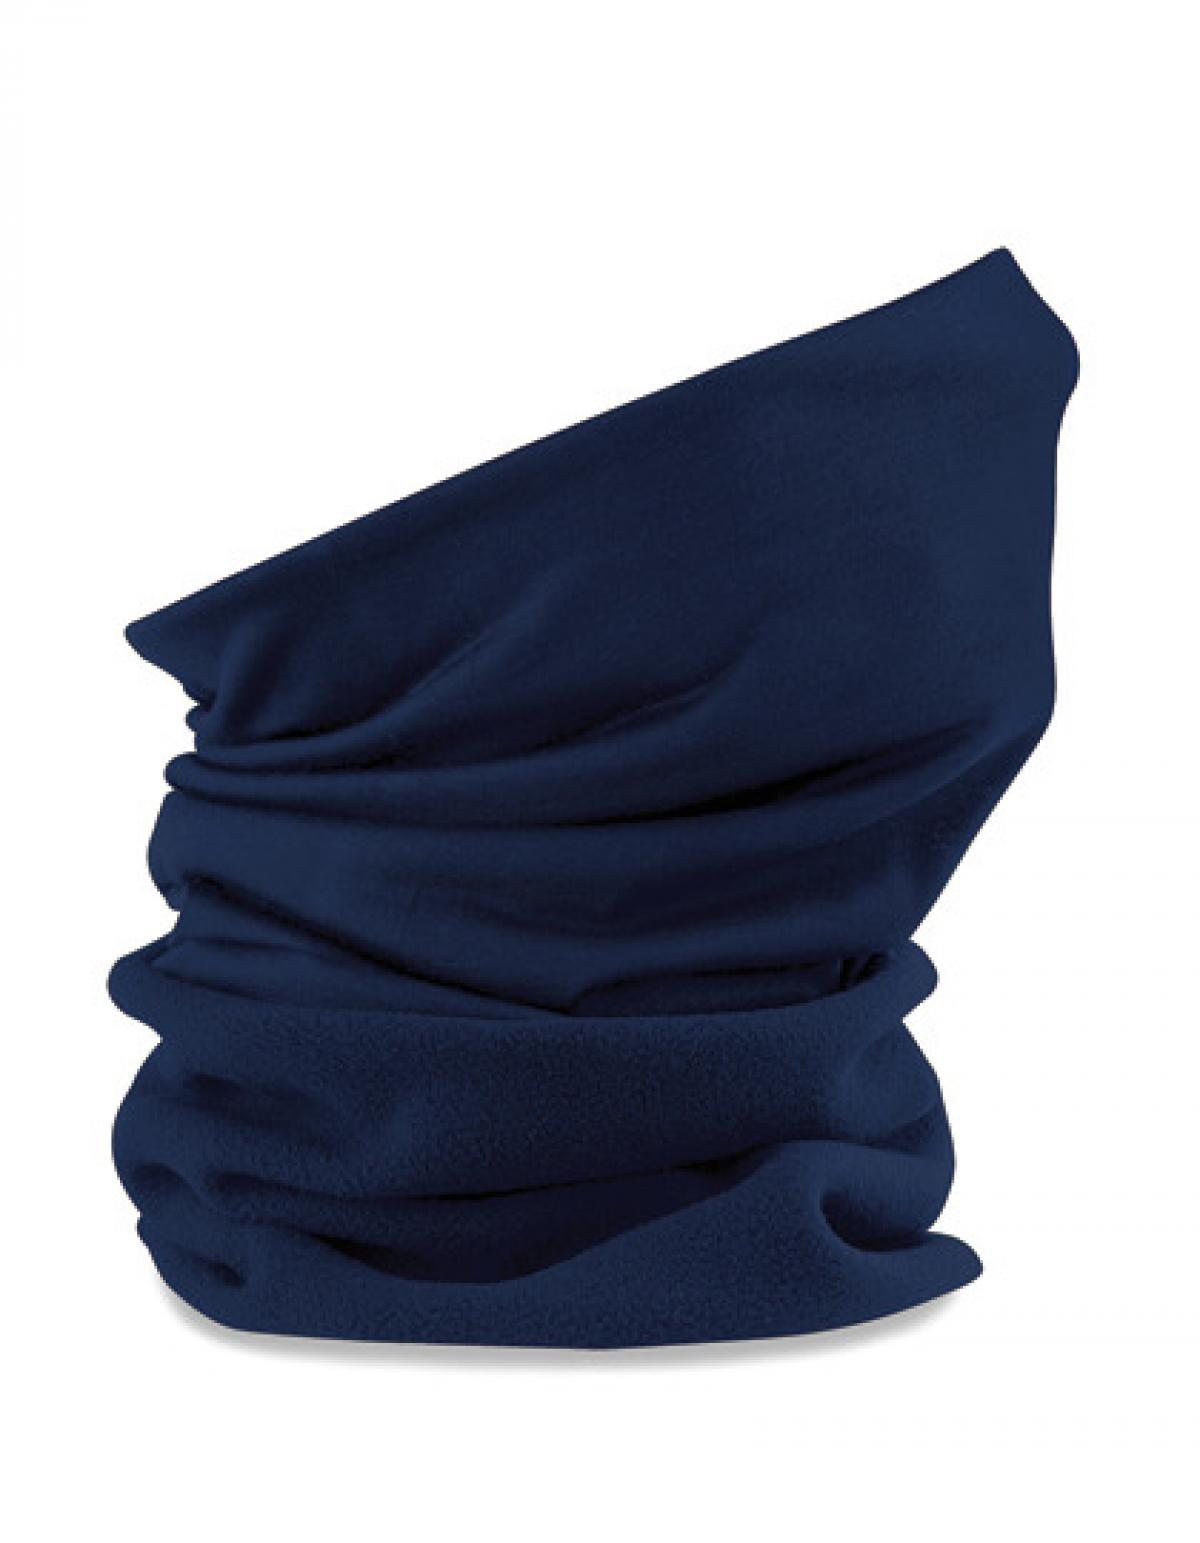 Schlauchschal morf suprafleece damen winter schal for Schal binden damen